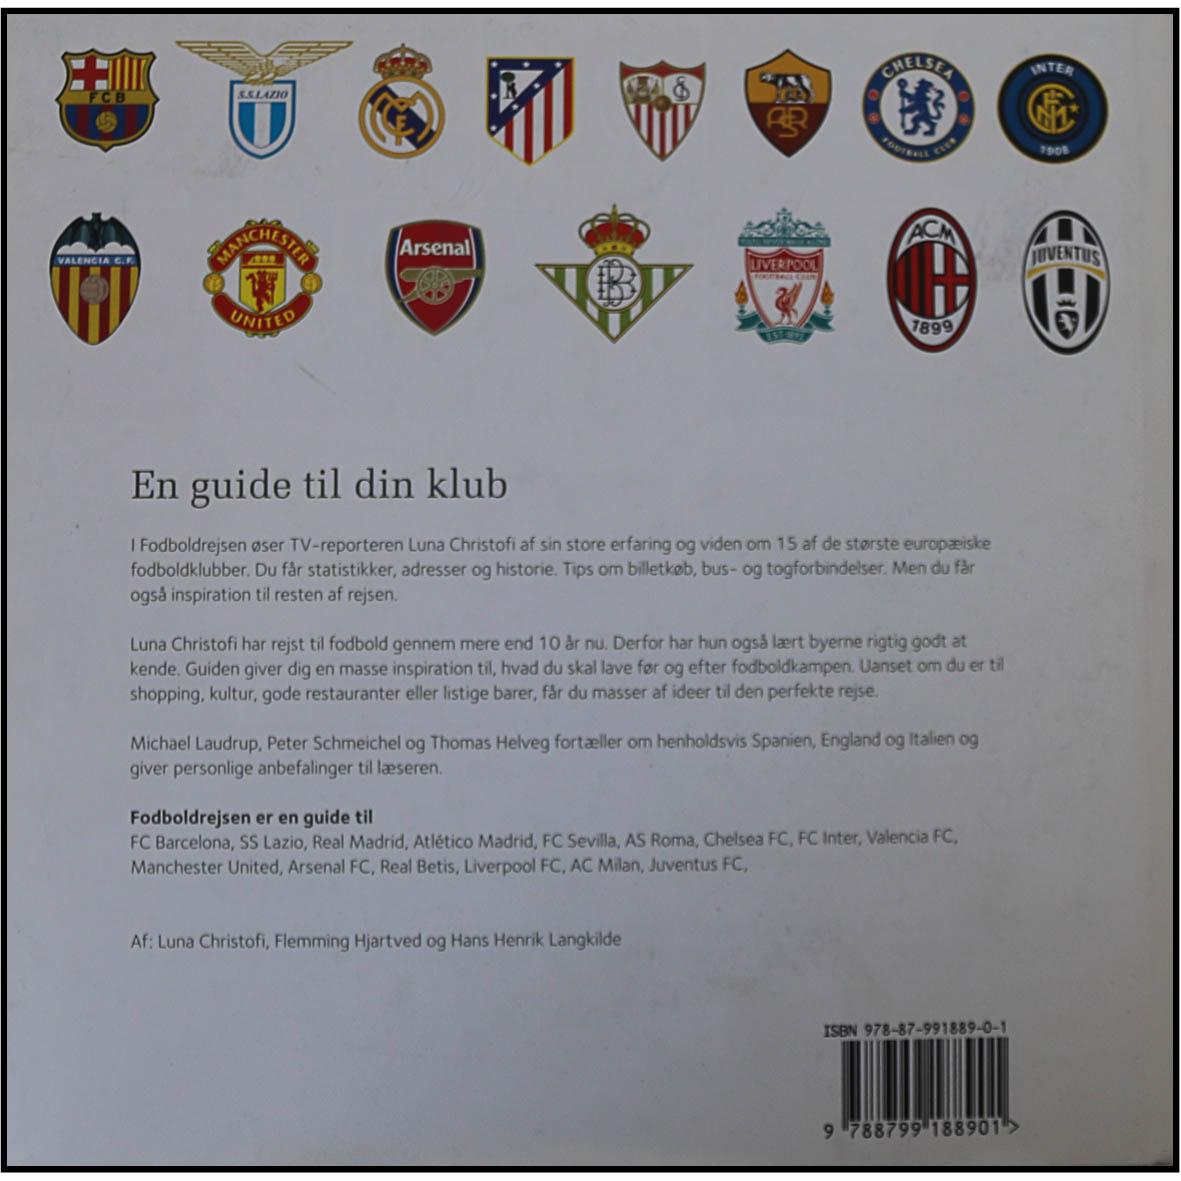 Luna Christofi - Fodboldrejsen